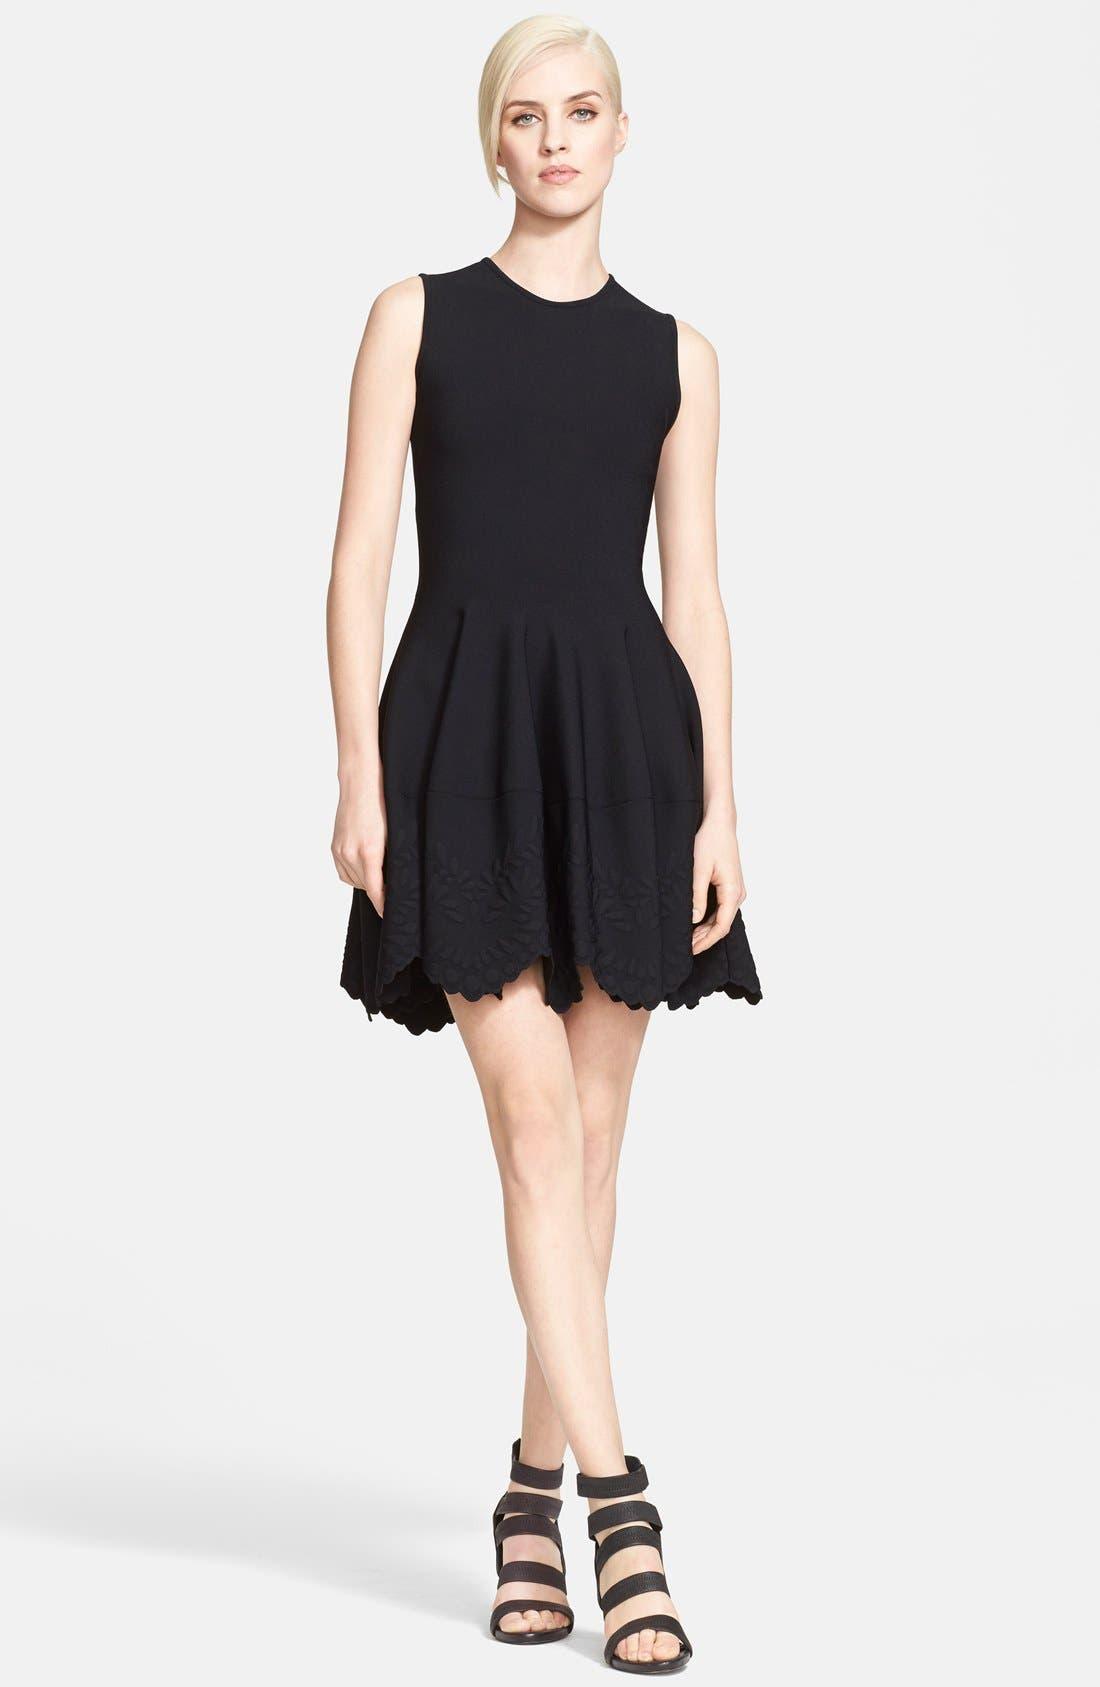 Alternate Image 1 Selected - Alexander McQueen Jacquard Knit Dress